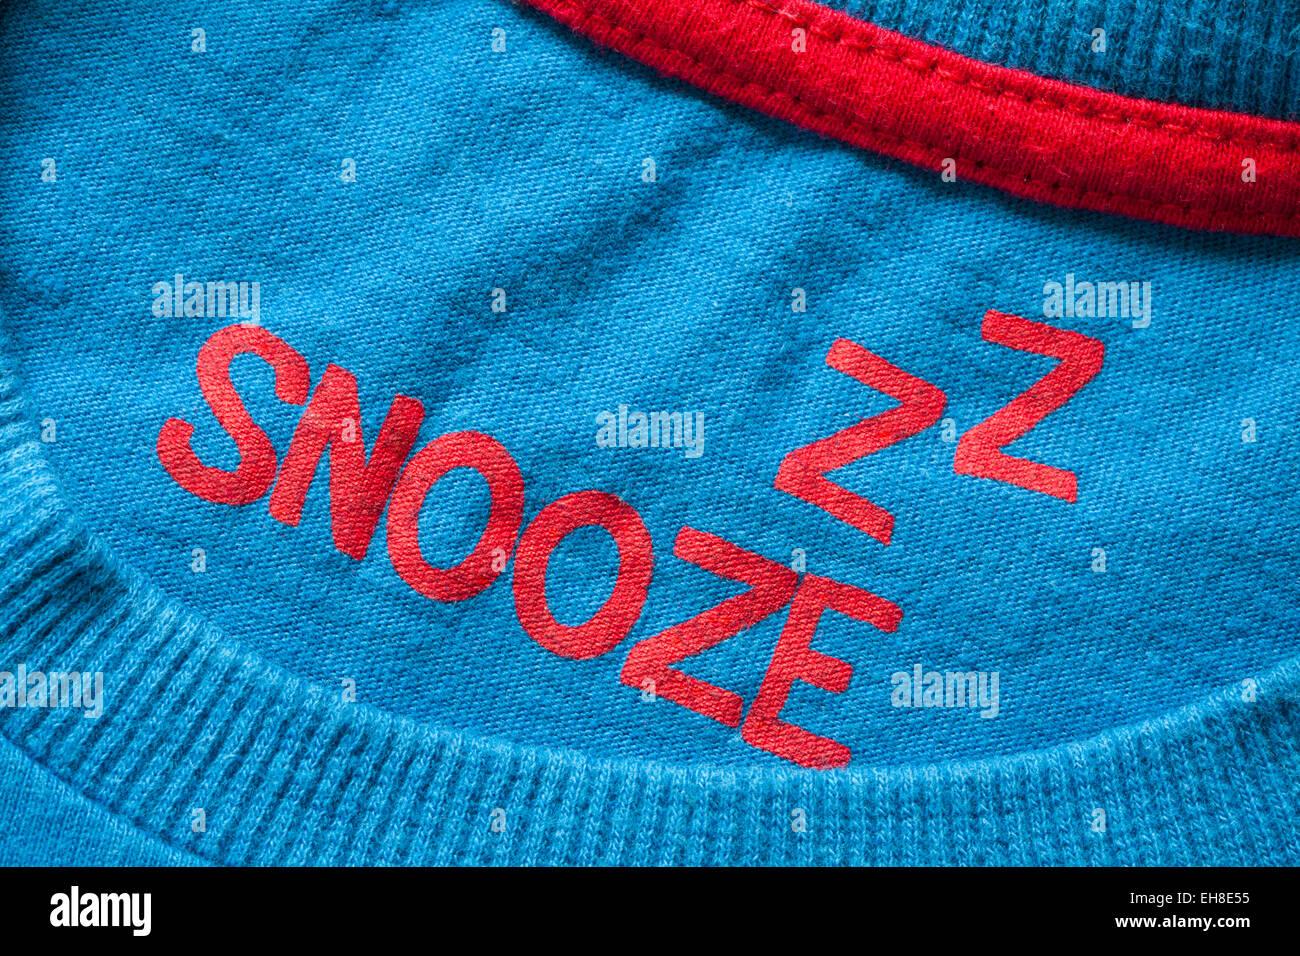 Z Z snooze stamped in child's top garment, part of pyjamas set - Stock Image